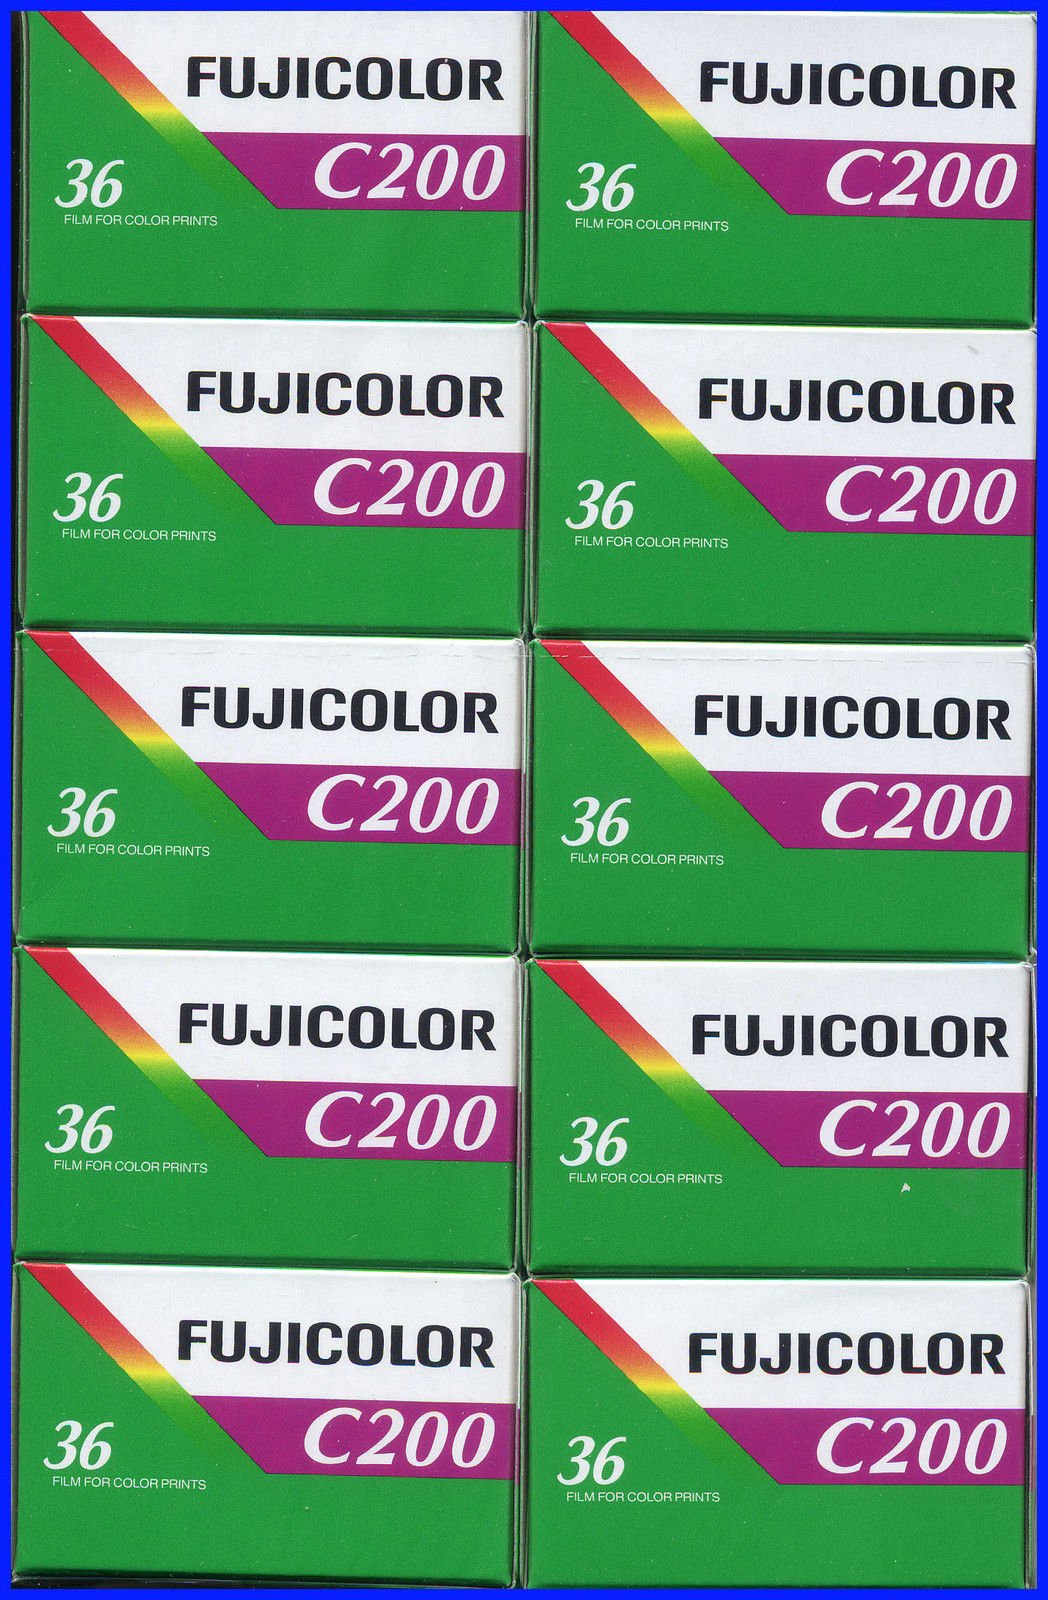 10 Rolls Fujifilm Fujicolor C200 200 ISO 36 exp 35mm Color Negative Film (Pack of 10) by Fujifilm